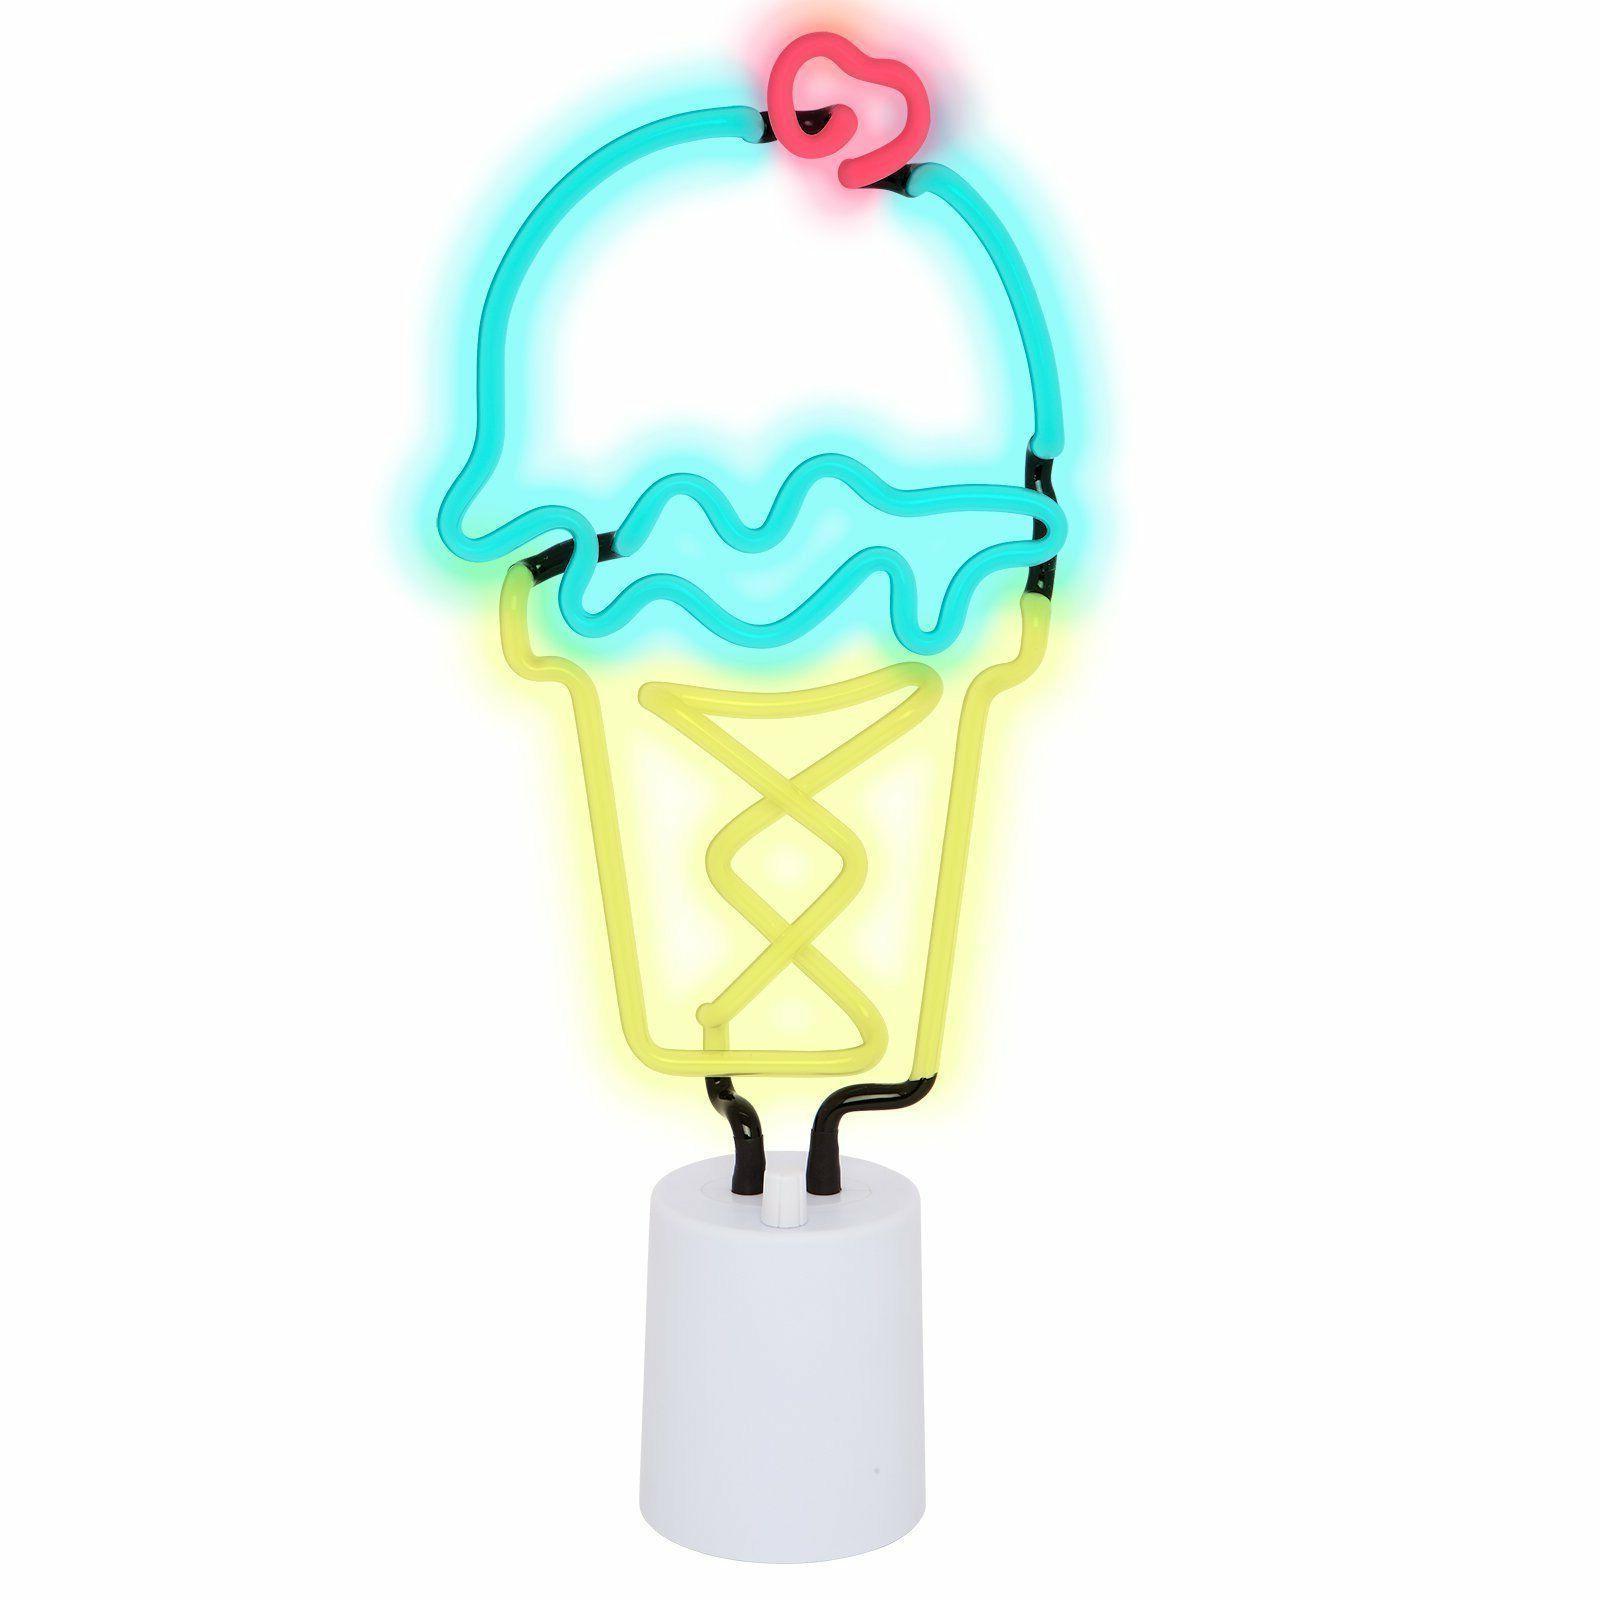 SUNNYLIFE ICE CREAM NEON LIGHT LARGE Interior PARTTY KID CHI